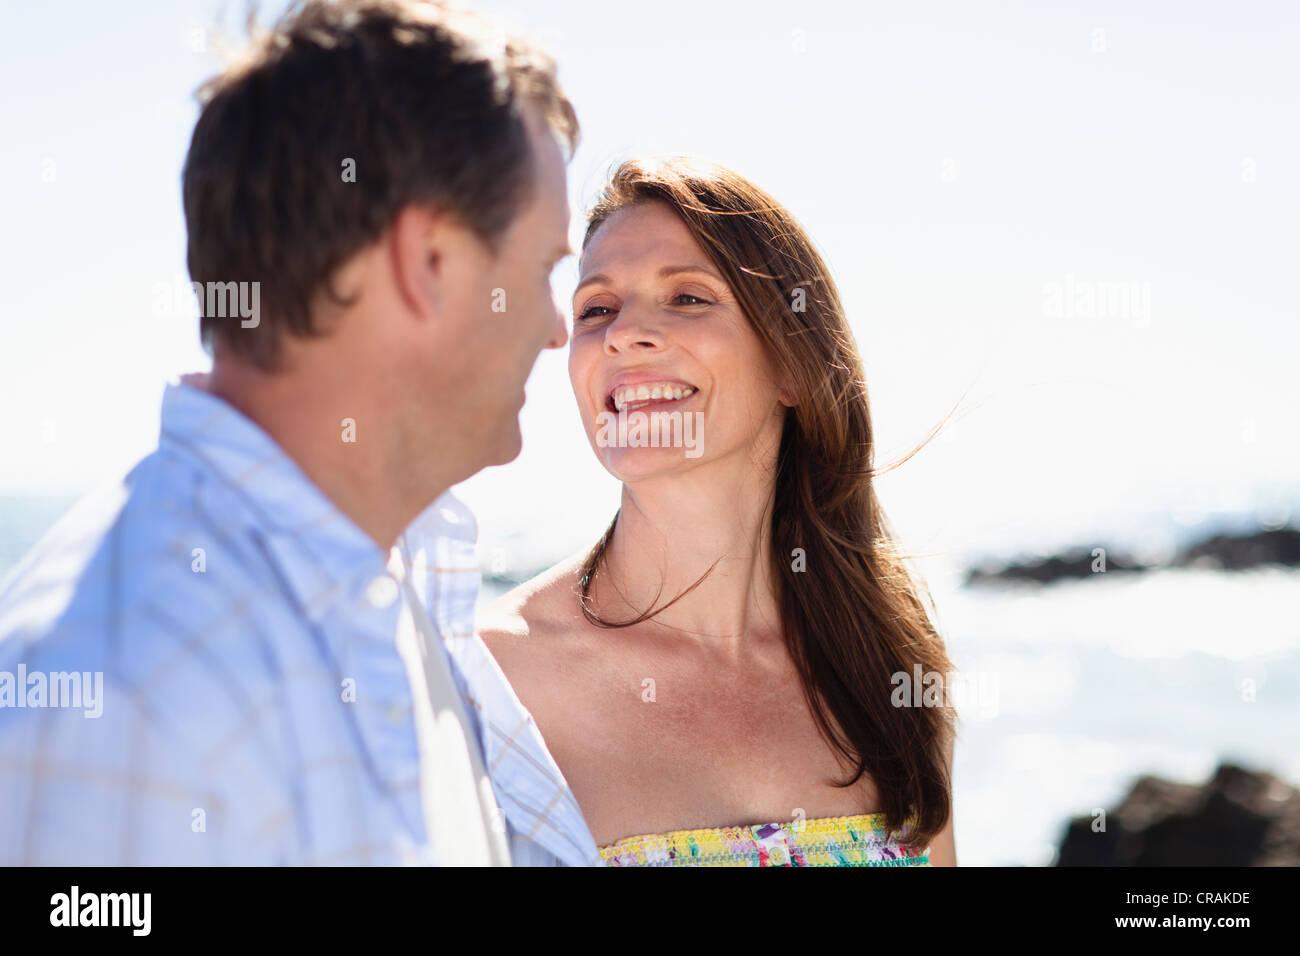 Smiling couple walking outdoors - Stock Image